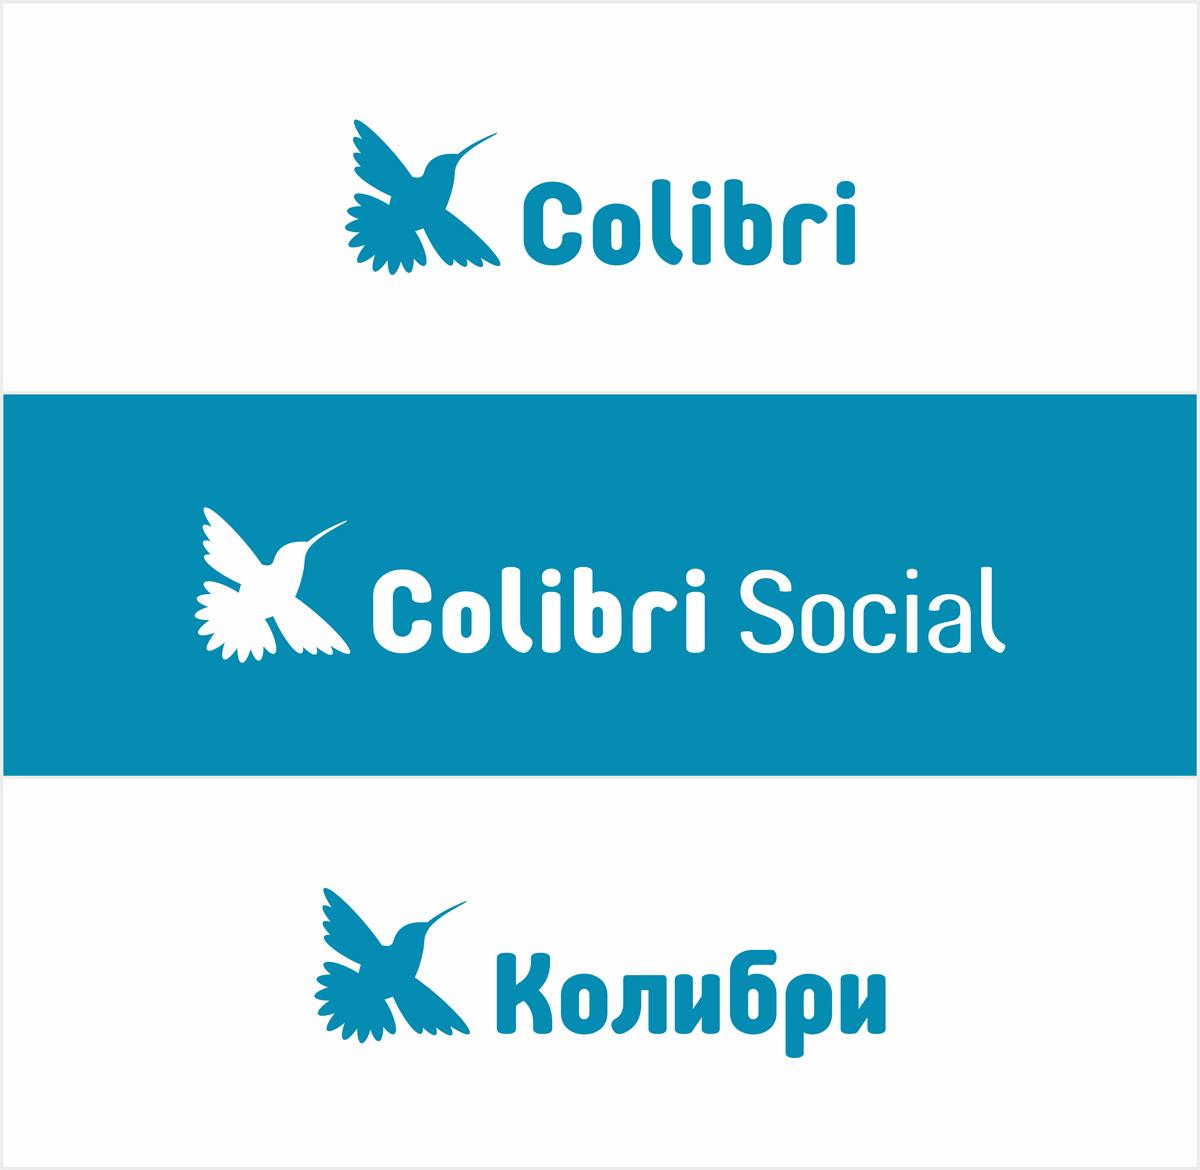 Дизайнер, разработка логотипа компании фото f_7505583409136bb6.jpg